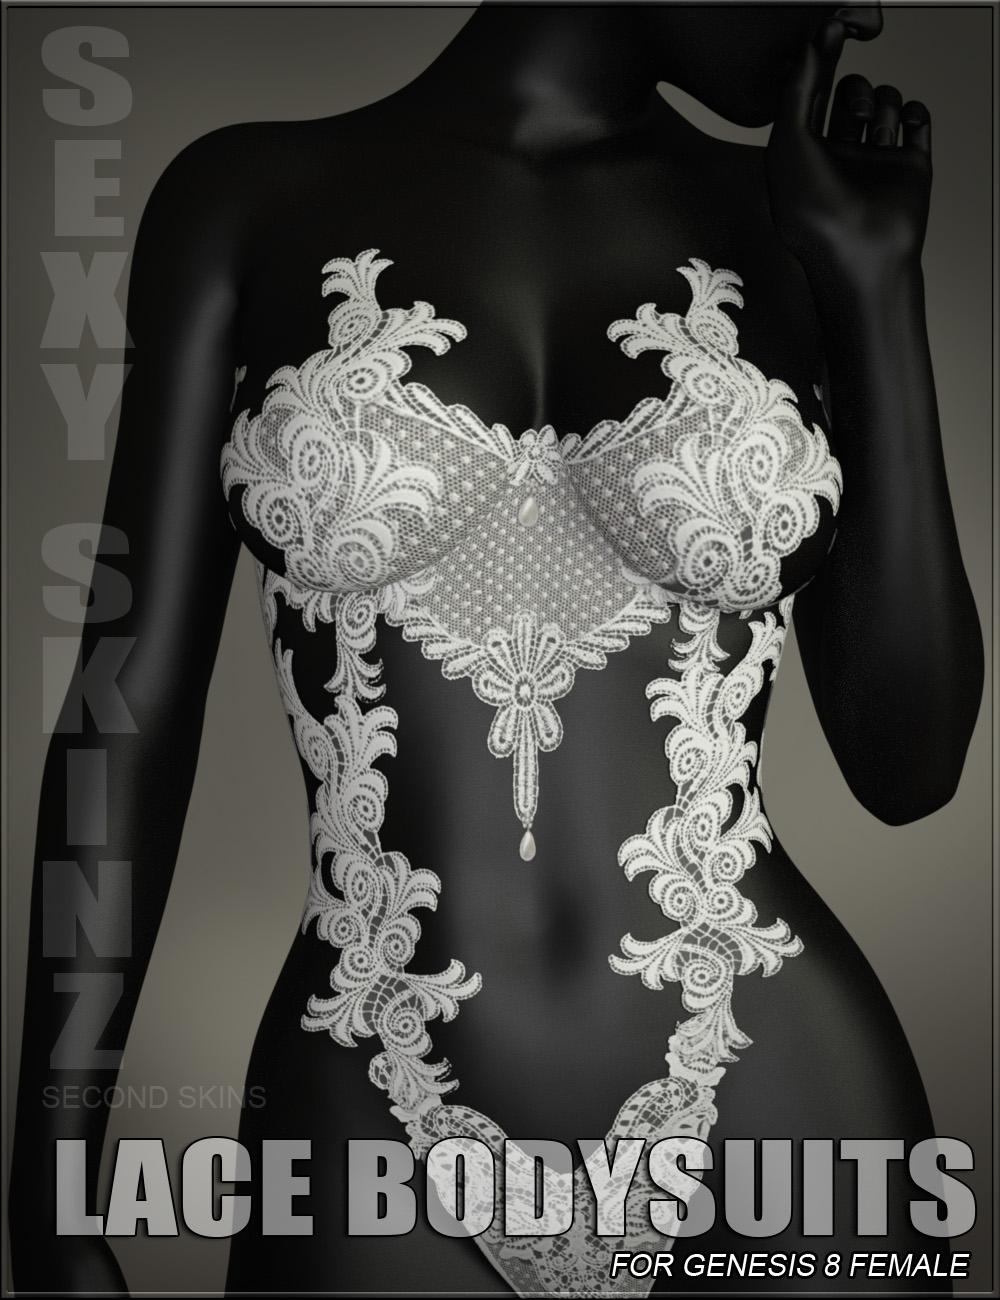 Sexy Skinz - Lace Bodysuits for Genesis 8 Female by: vyktohria, 3D Models by Daz 3D